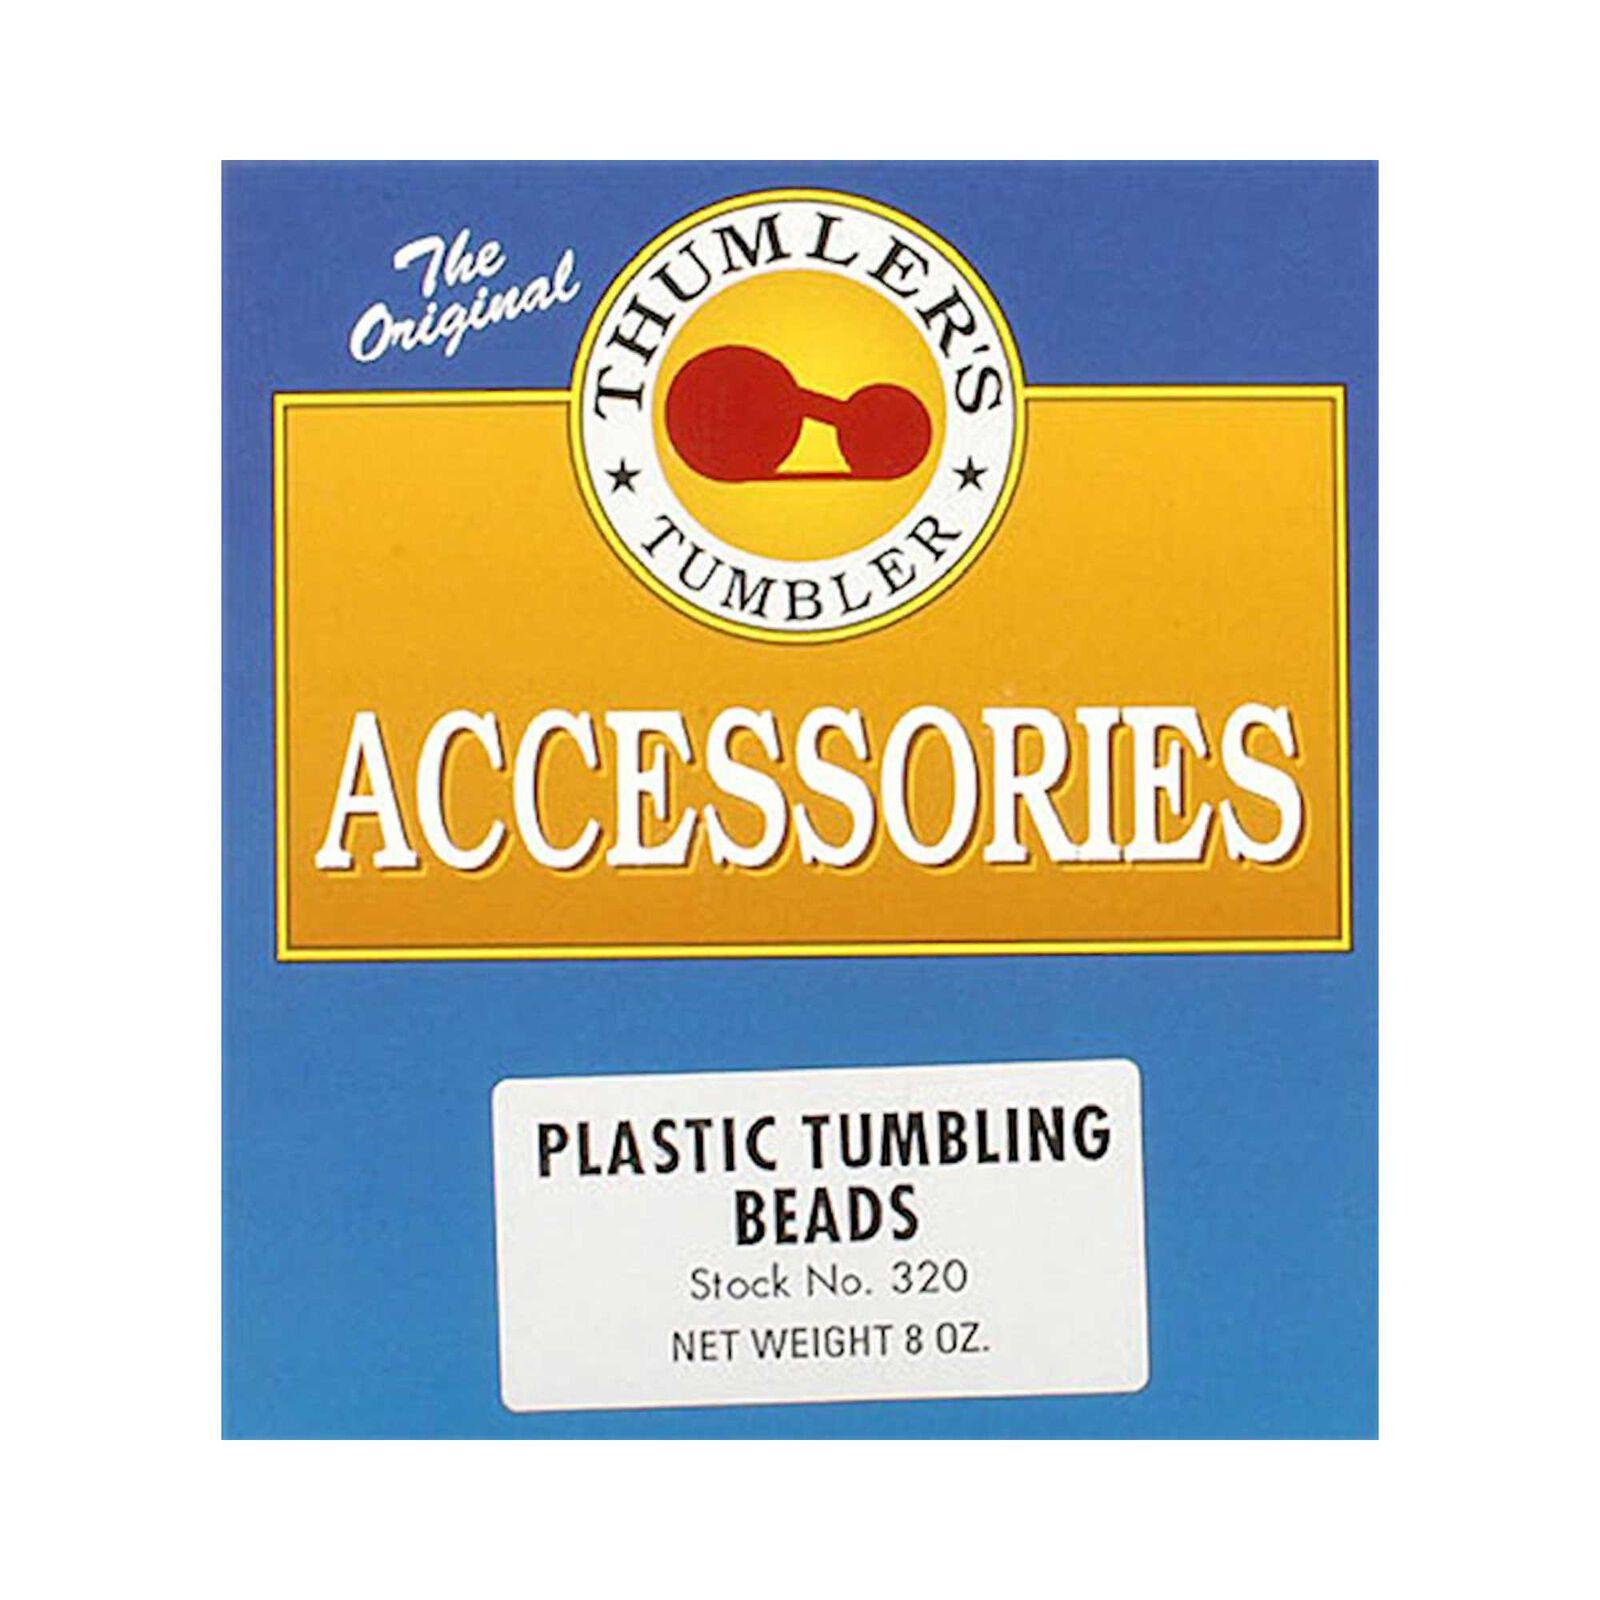 Plastic Tumbling Beads